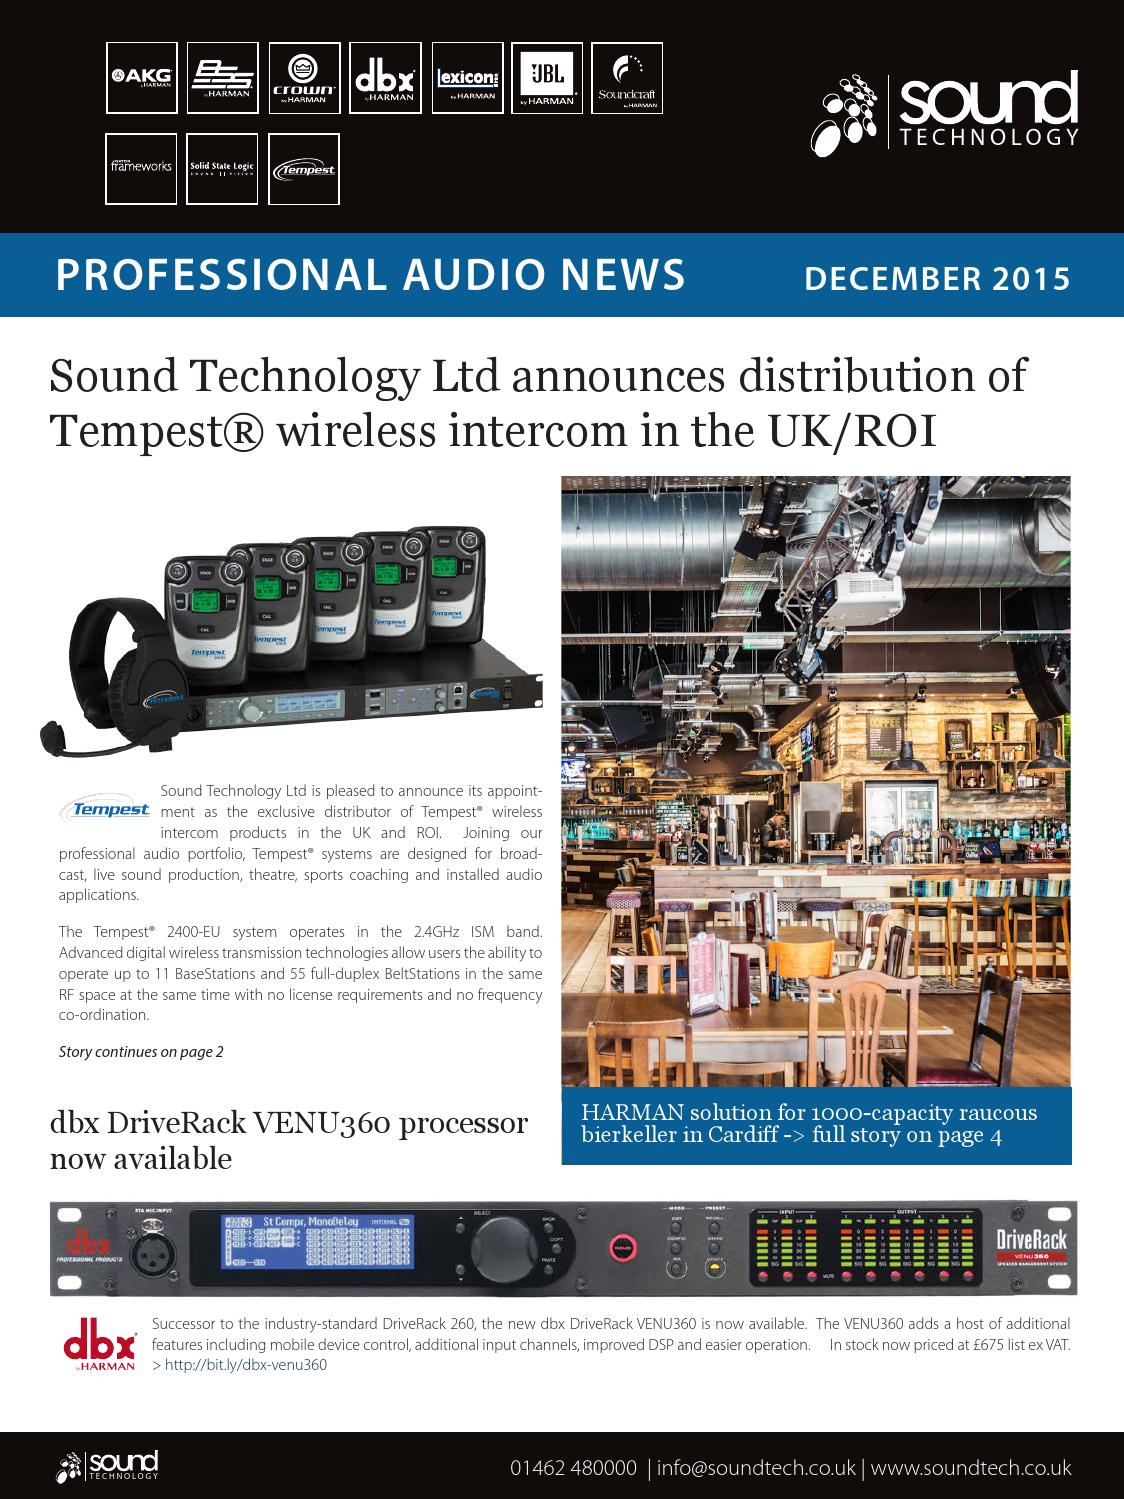 sound technology ltd professional audio newsletter